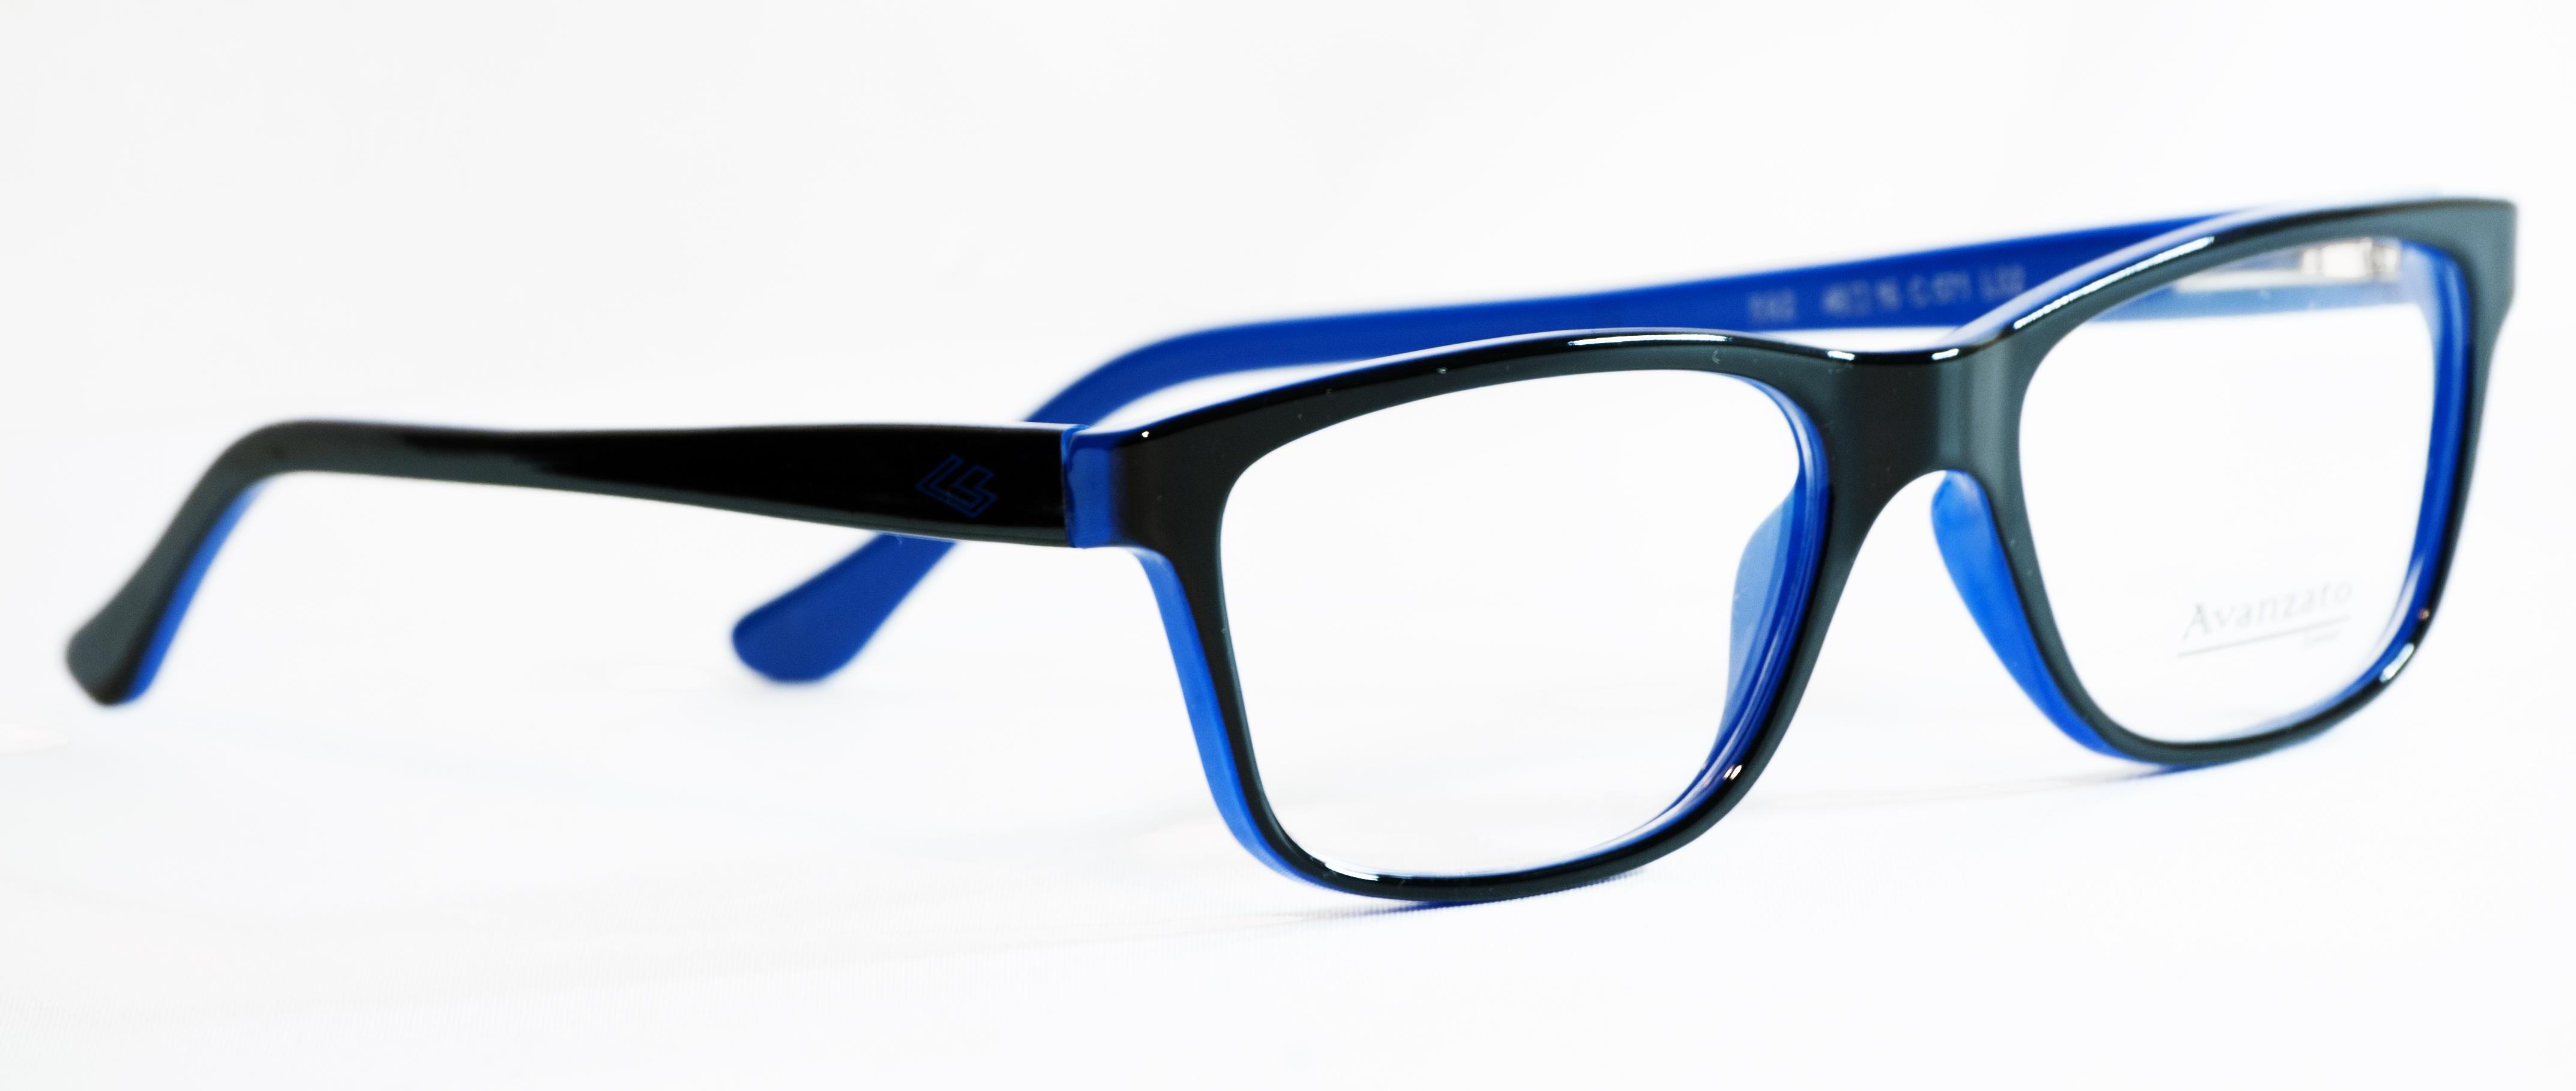 91b1107f8 Tecvision Industria Optica / Óculos Infantil - Avanzato Eyewear 592 T48